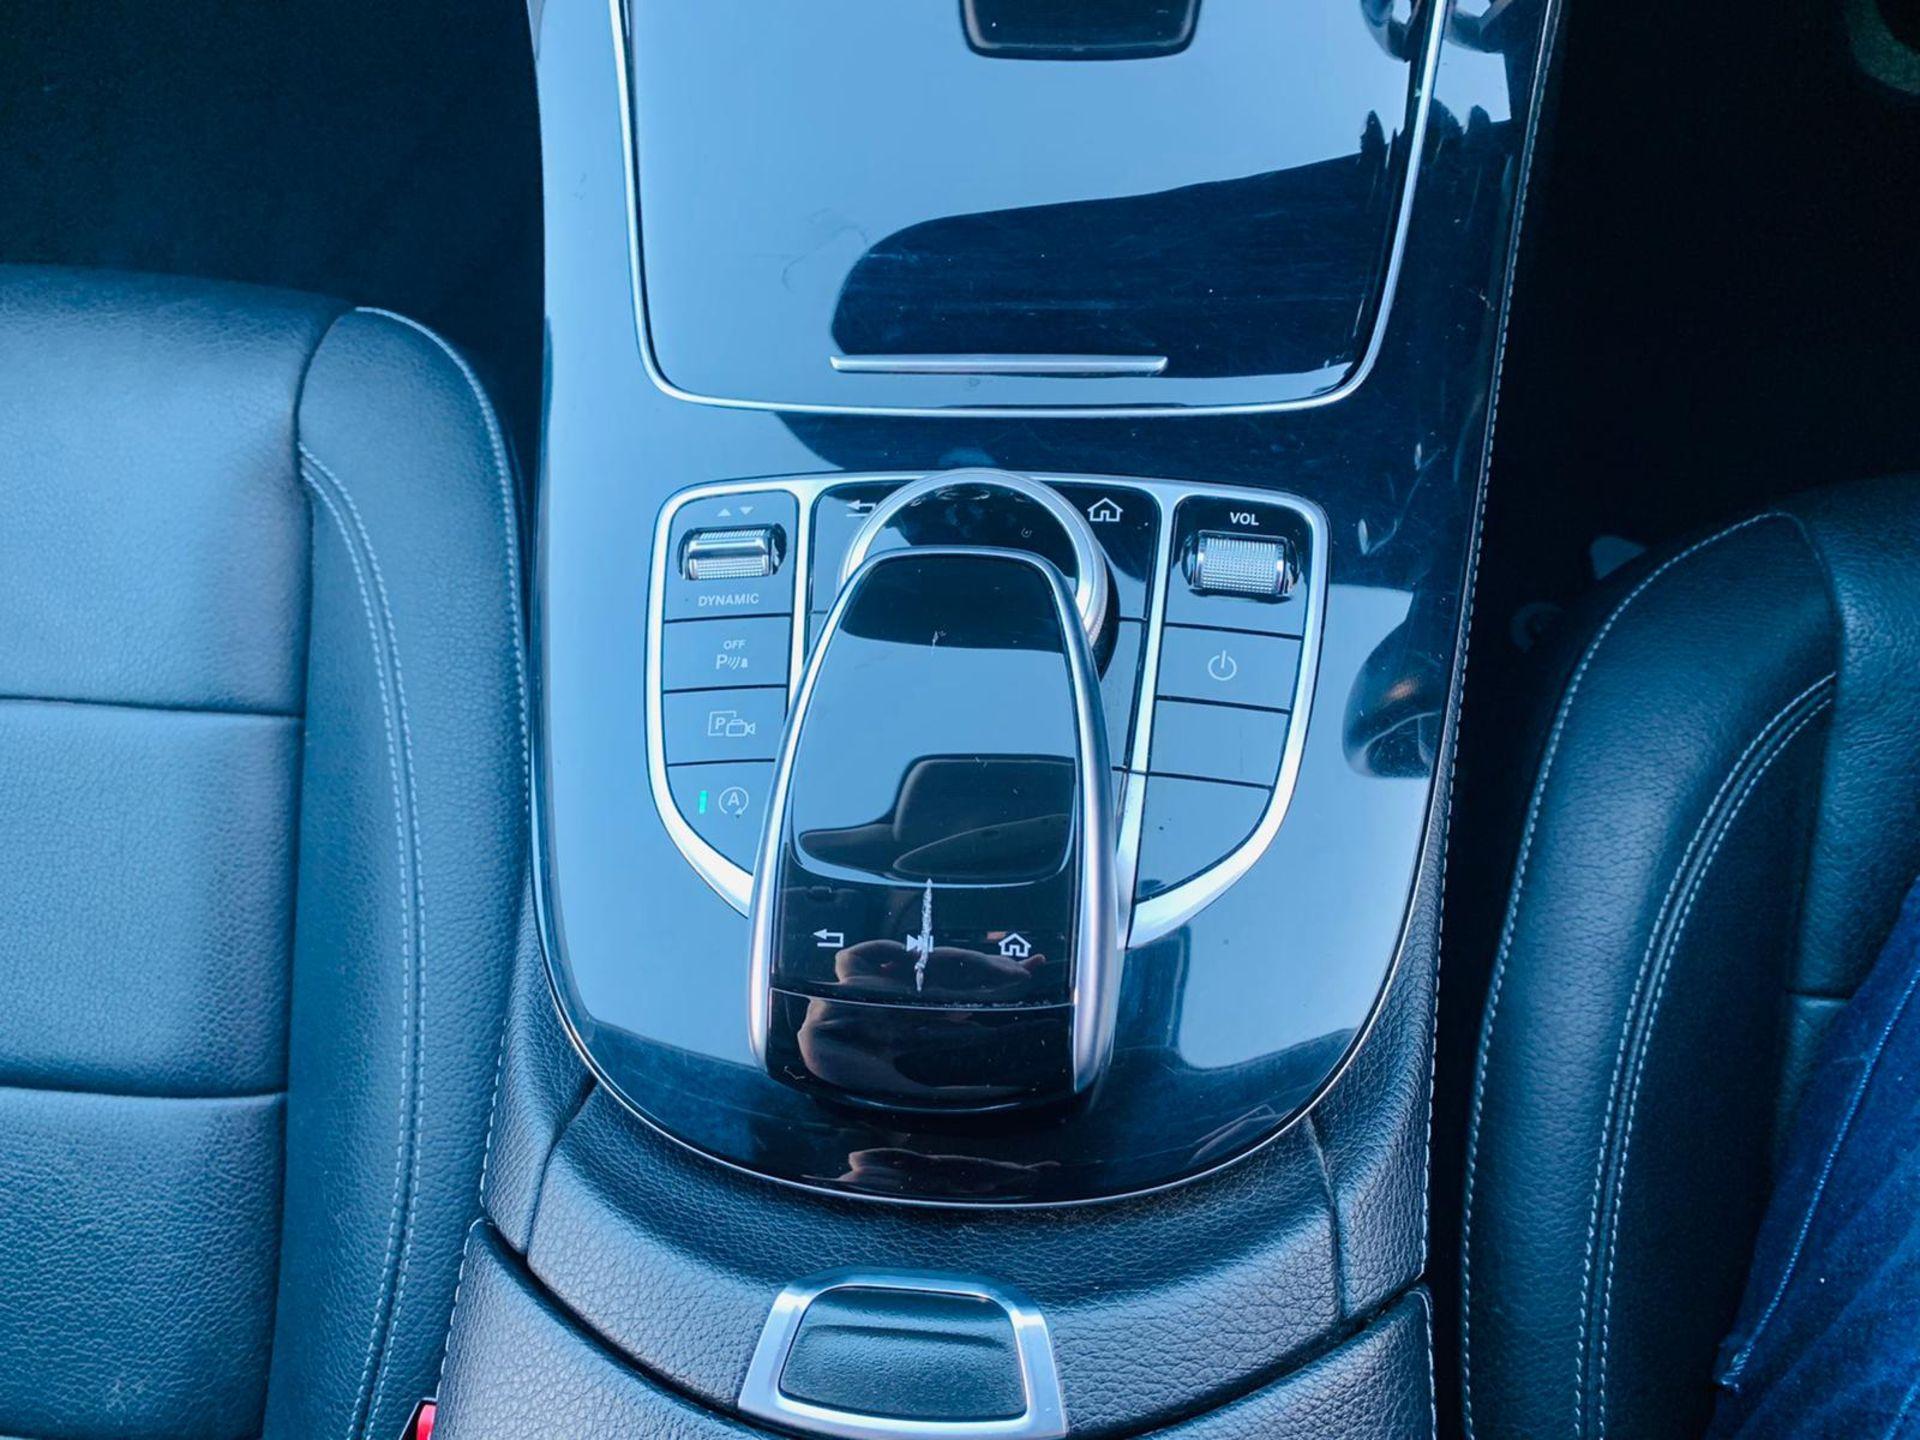 (RESERVE MET) Mercedes E220d Special Equipment Auto 2017 17 Reg - Sat Nav - Reversing Cam - Image 22 of 27